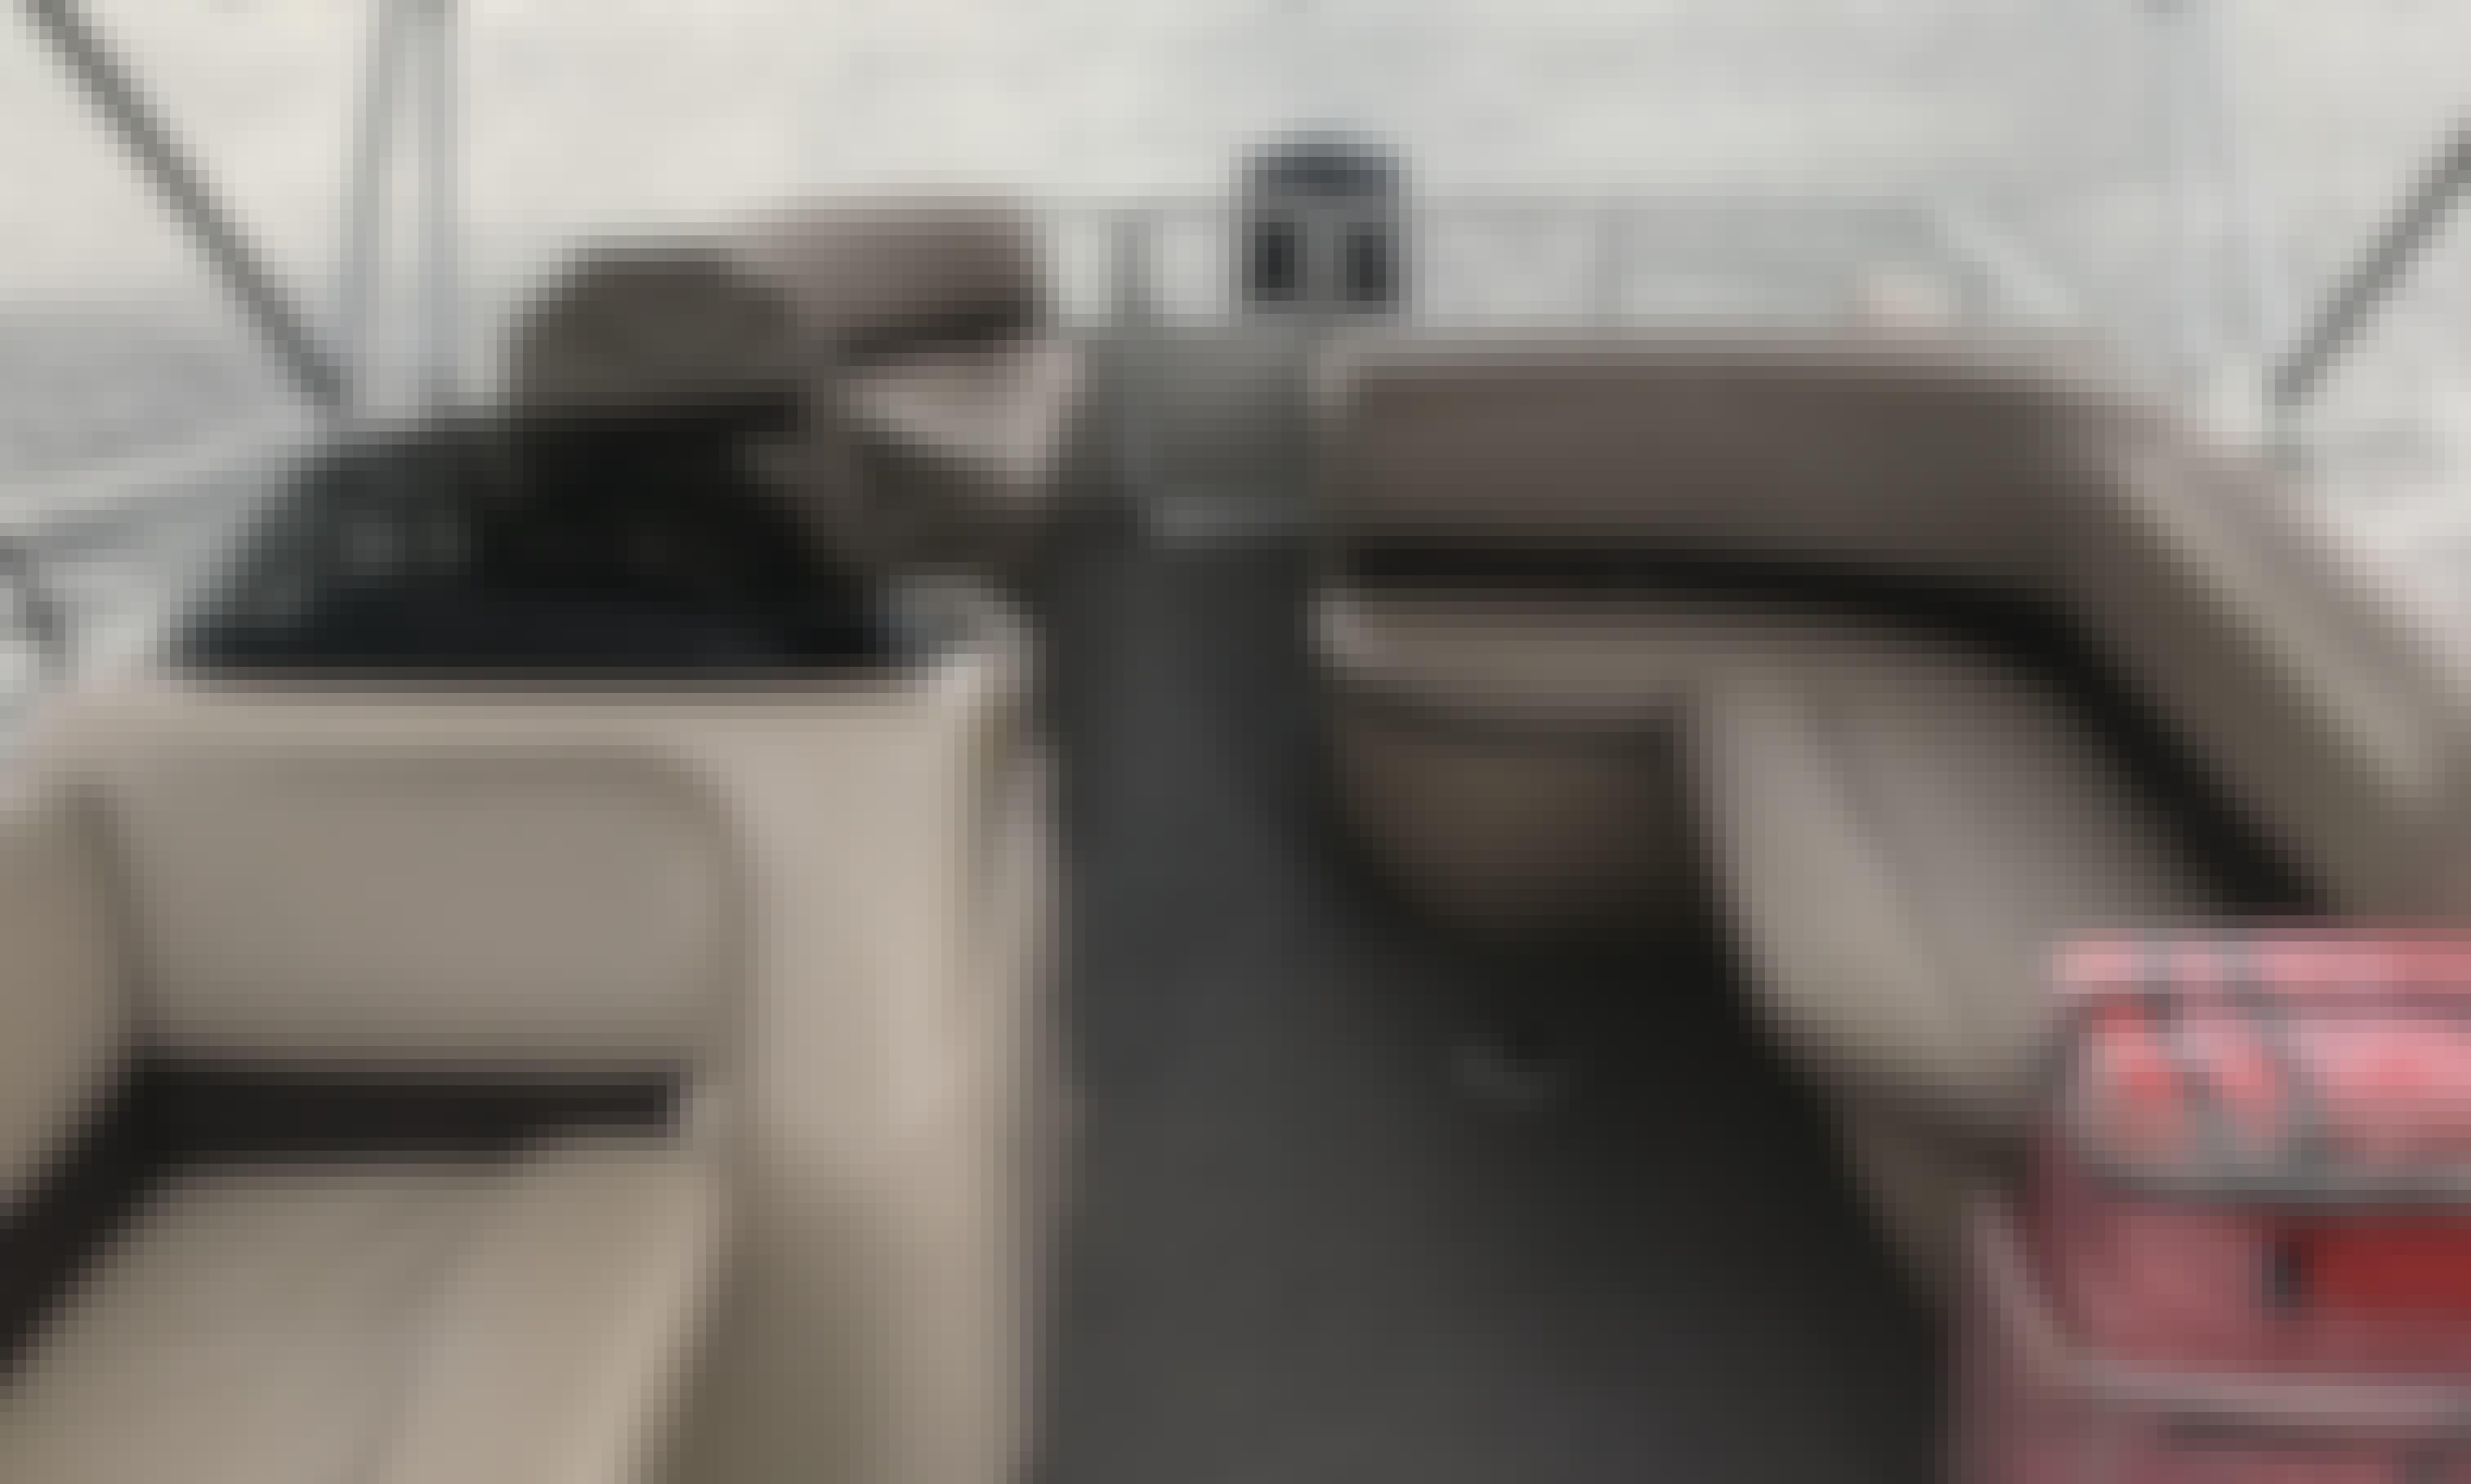 Hire 22' 115HP Luxury Pontoon Boat for 12 Passengers in Oconomowoc, Wisconsin